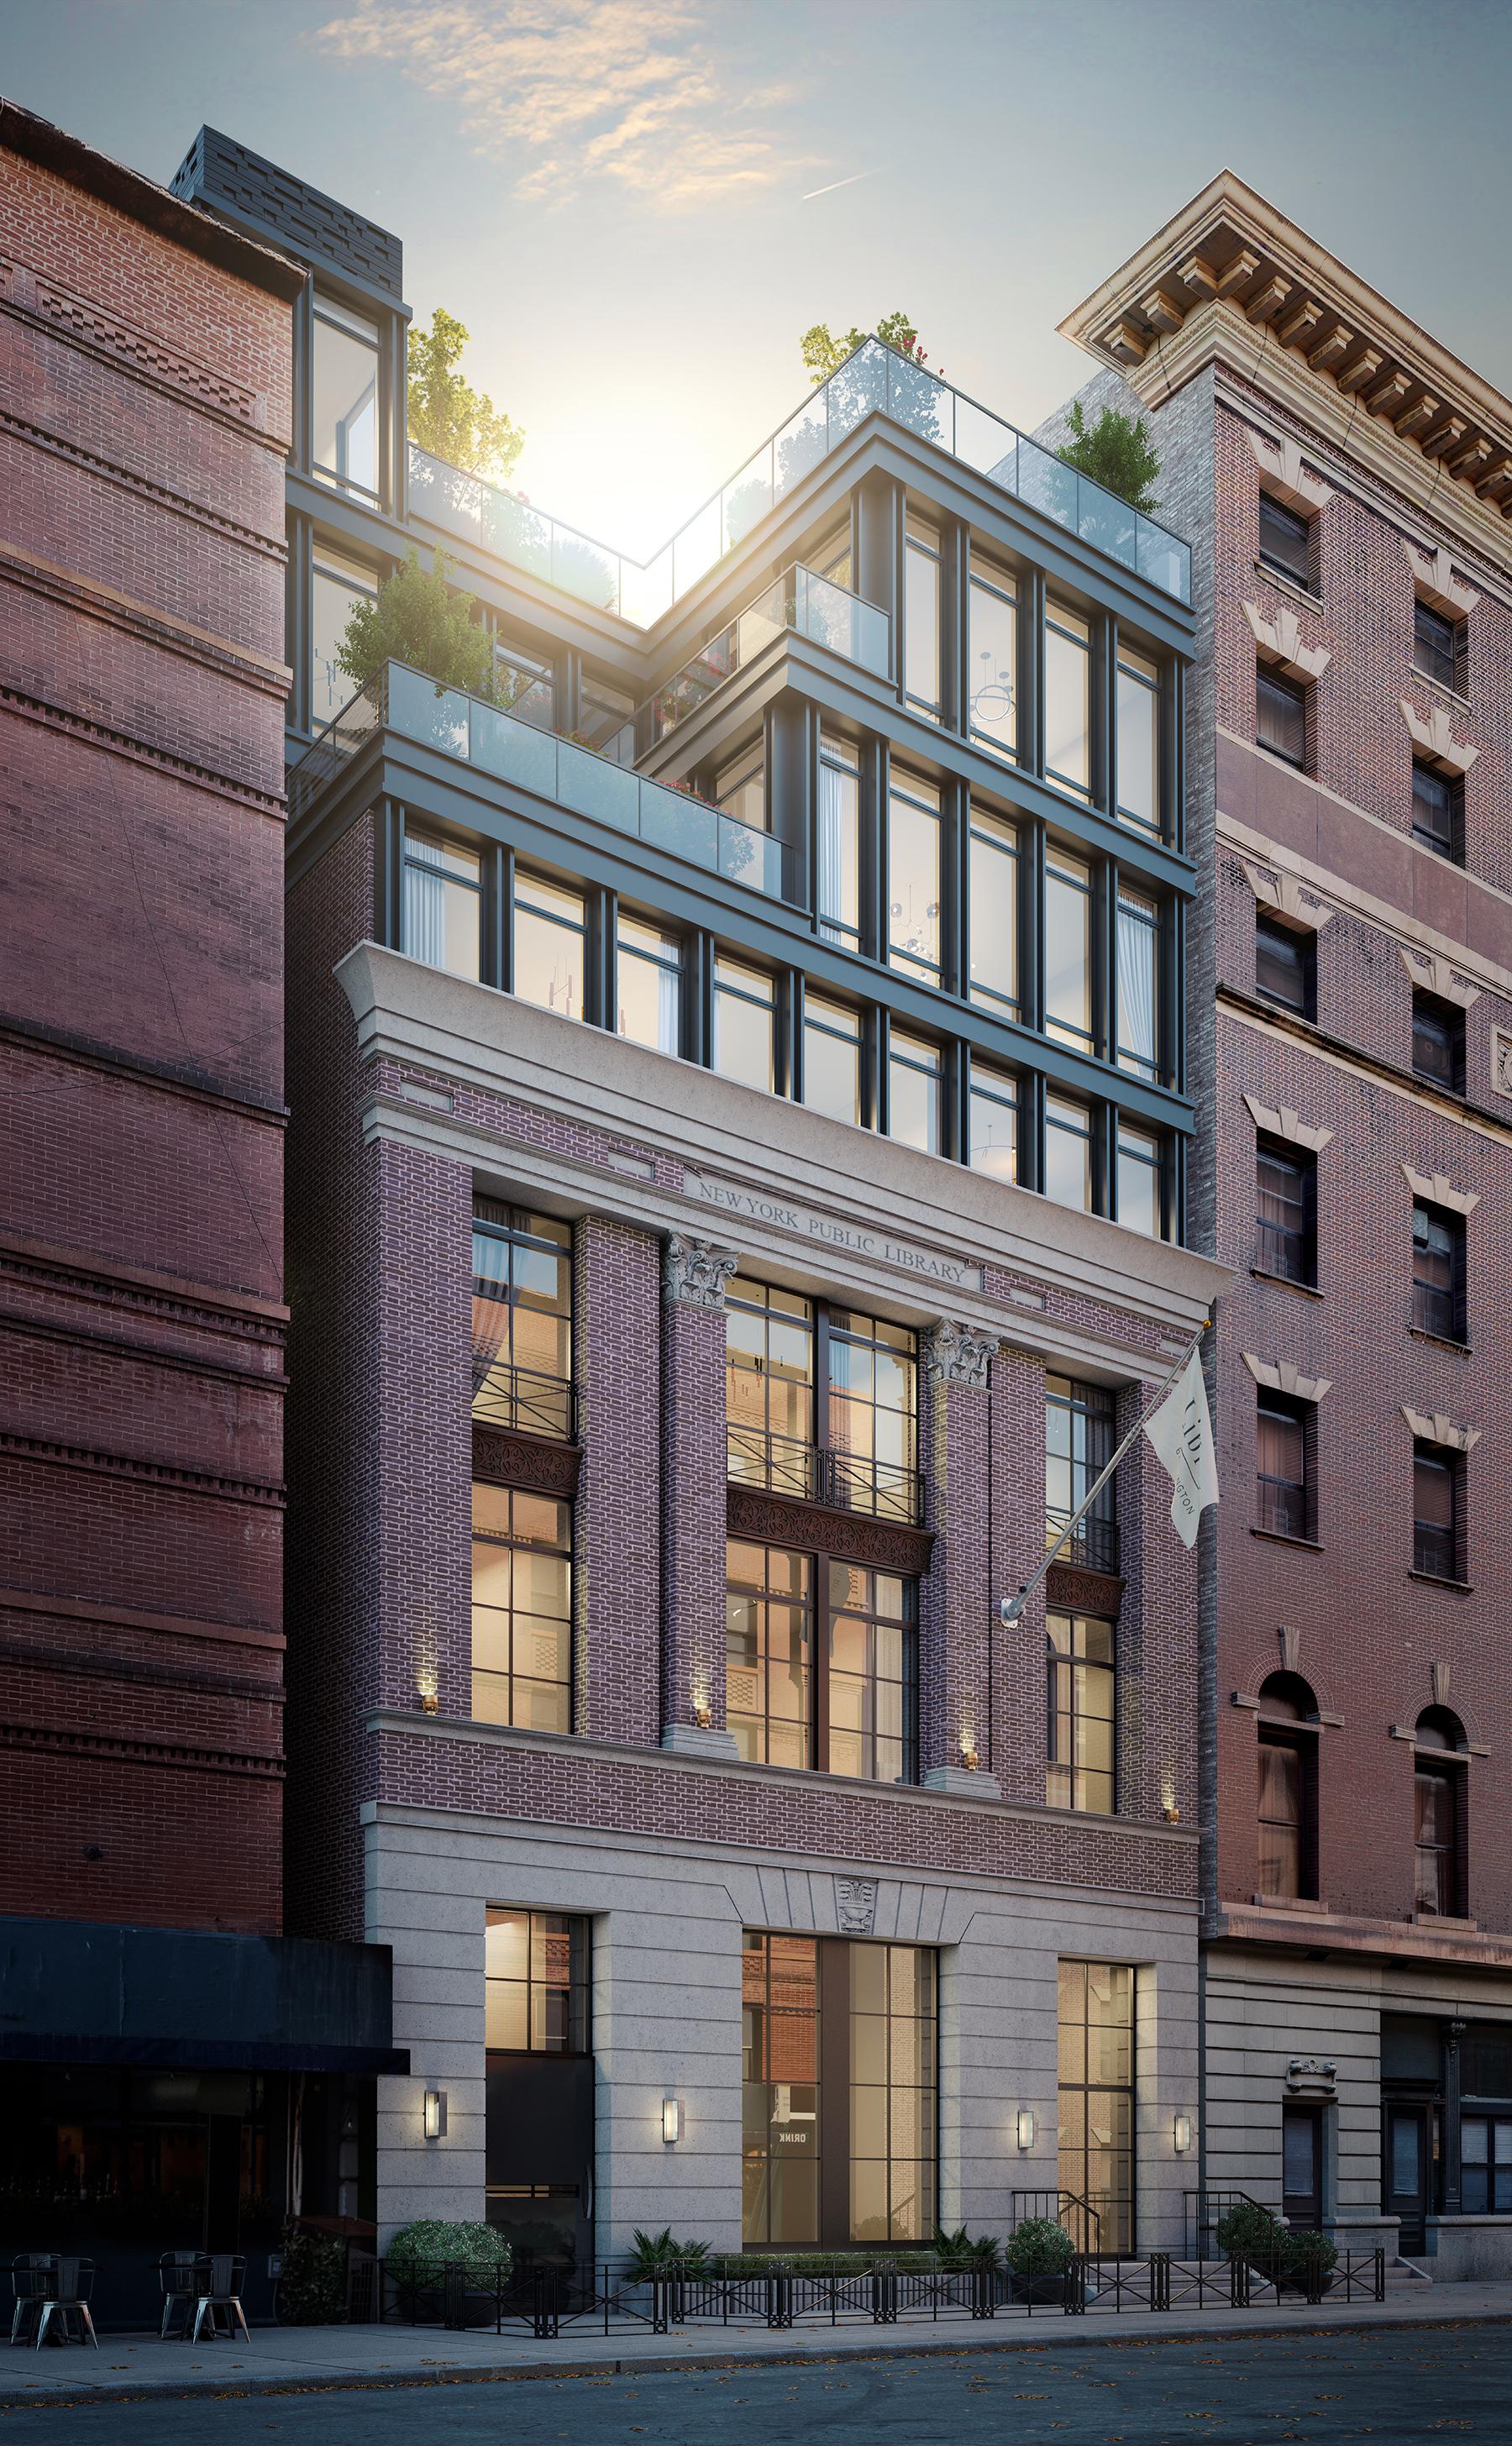 61 Rivington Street Lower East Side New York NY 10002